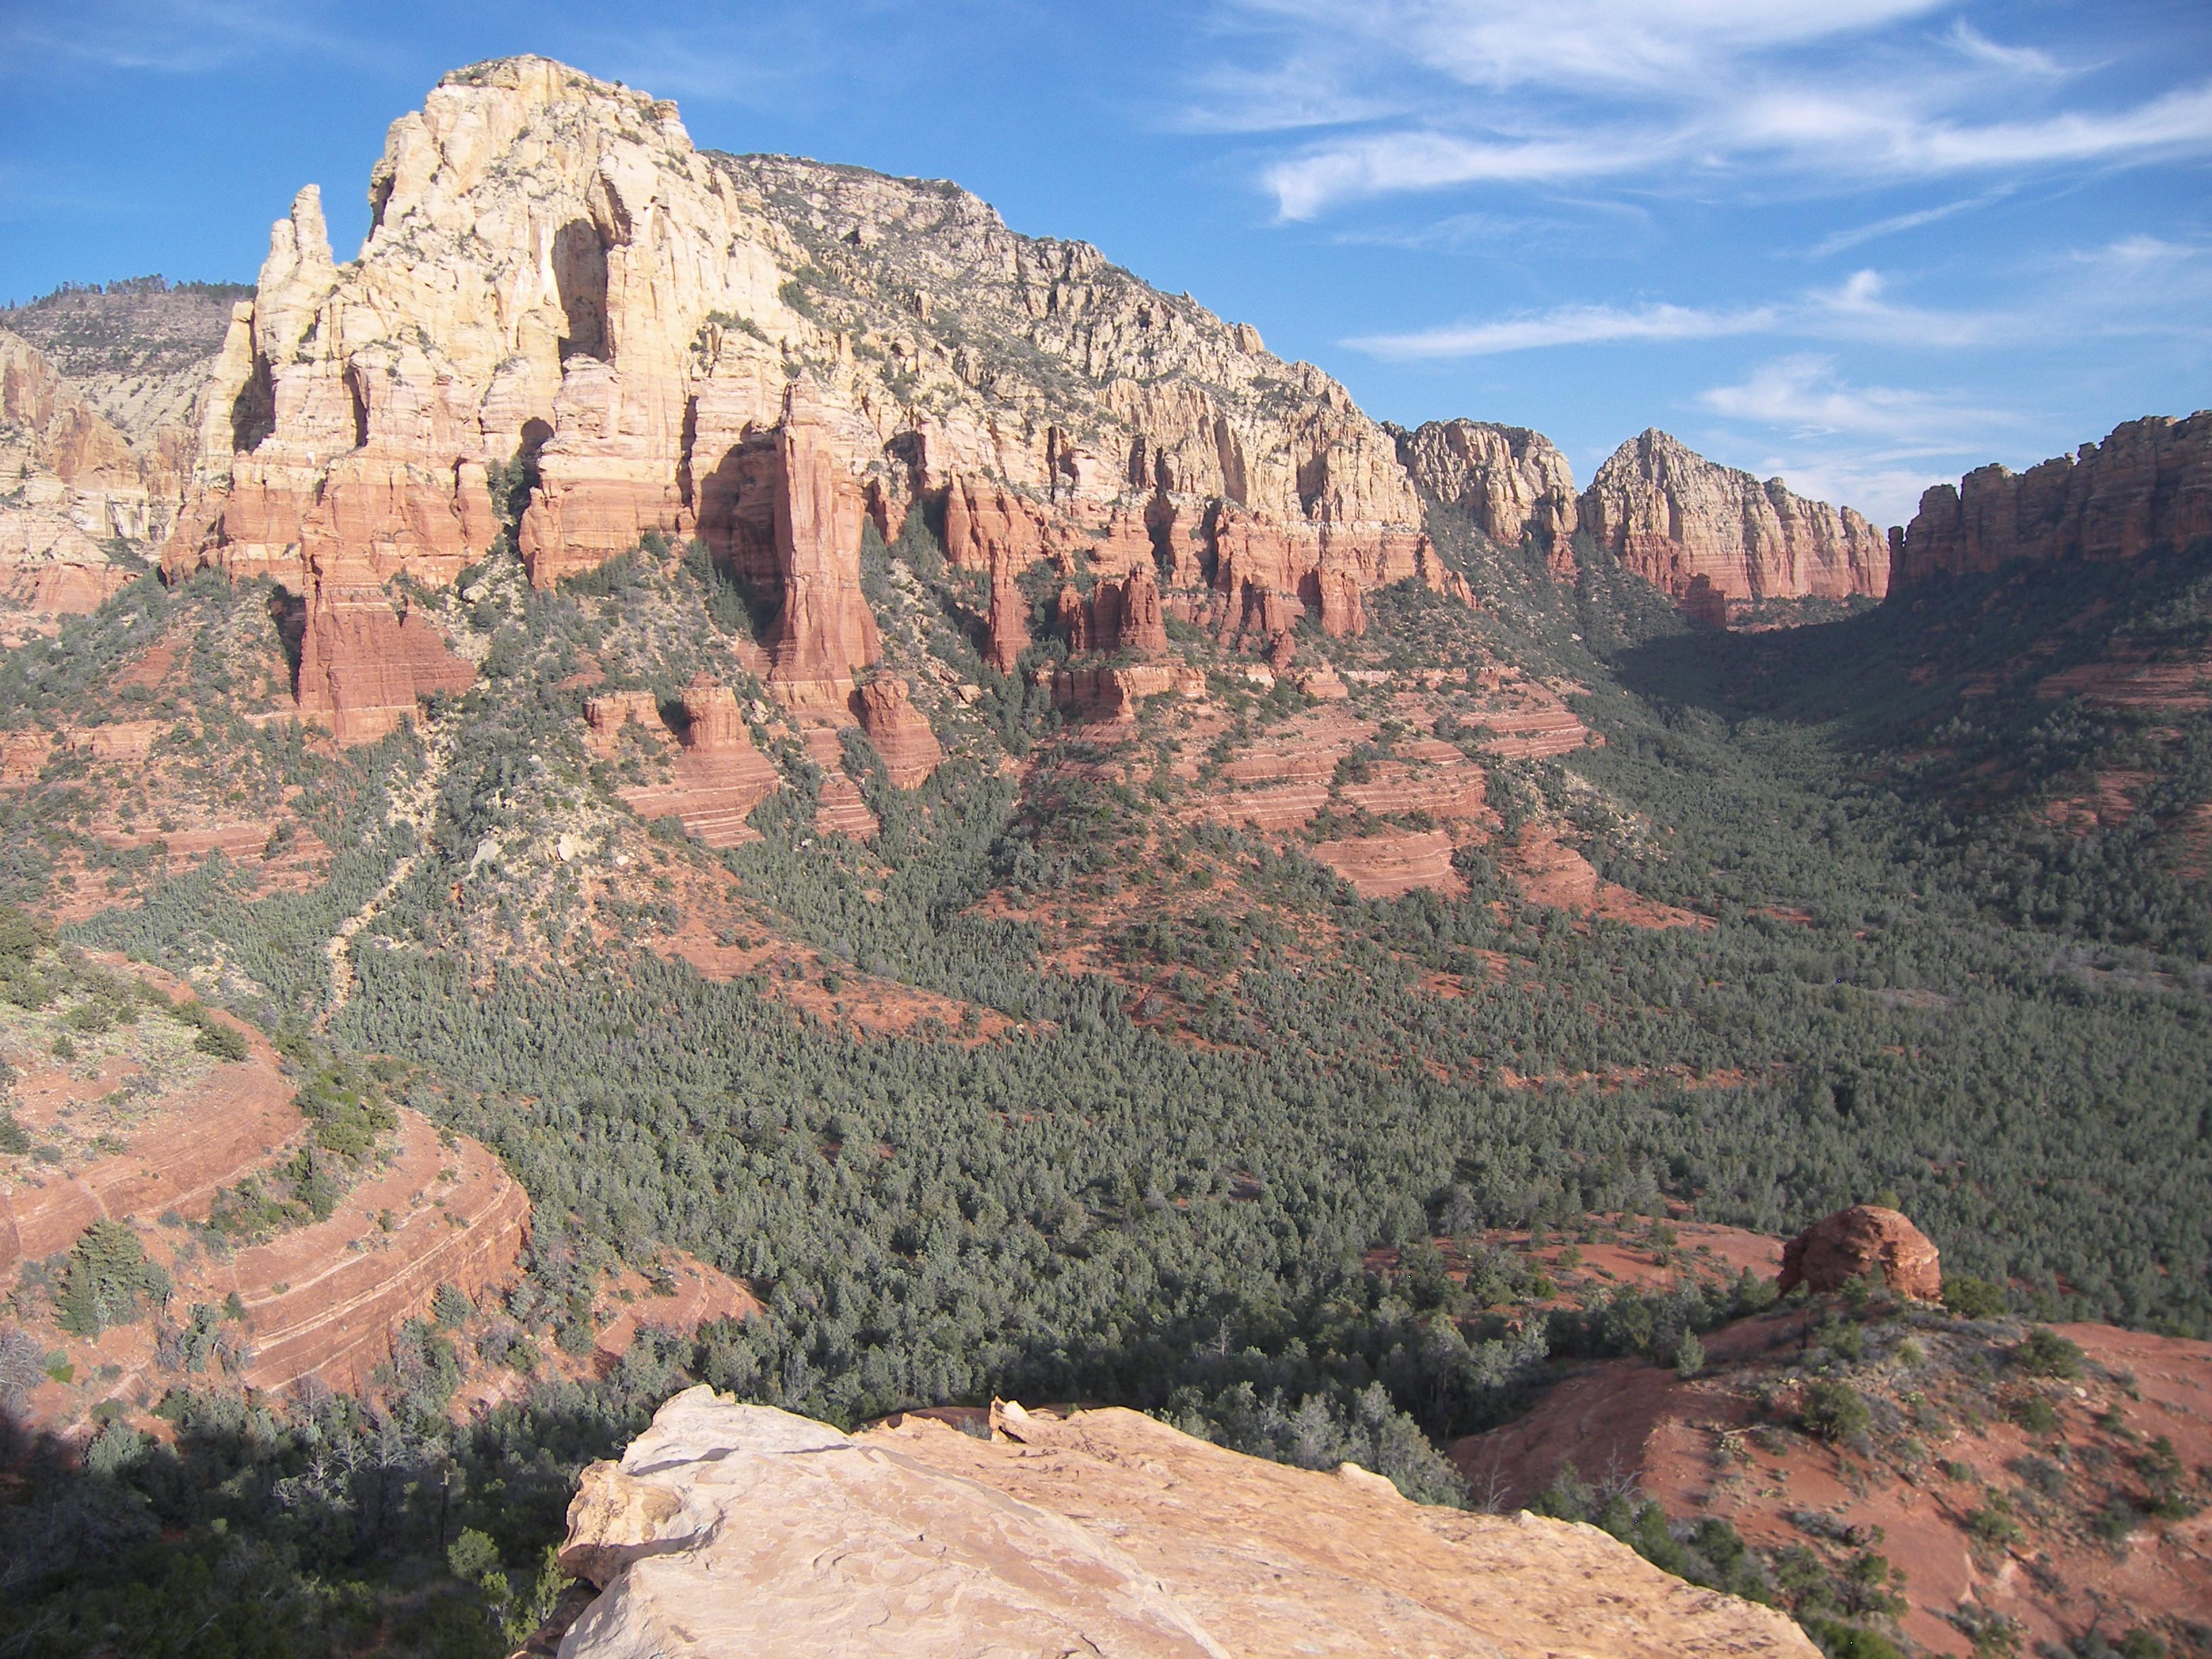 Brins Mesa Rim, Ridge, Red rocks, Outdoor, Rock, HQ Photo